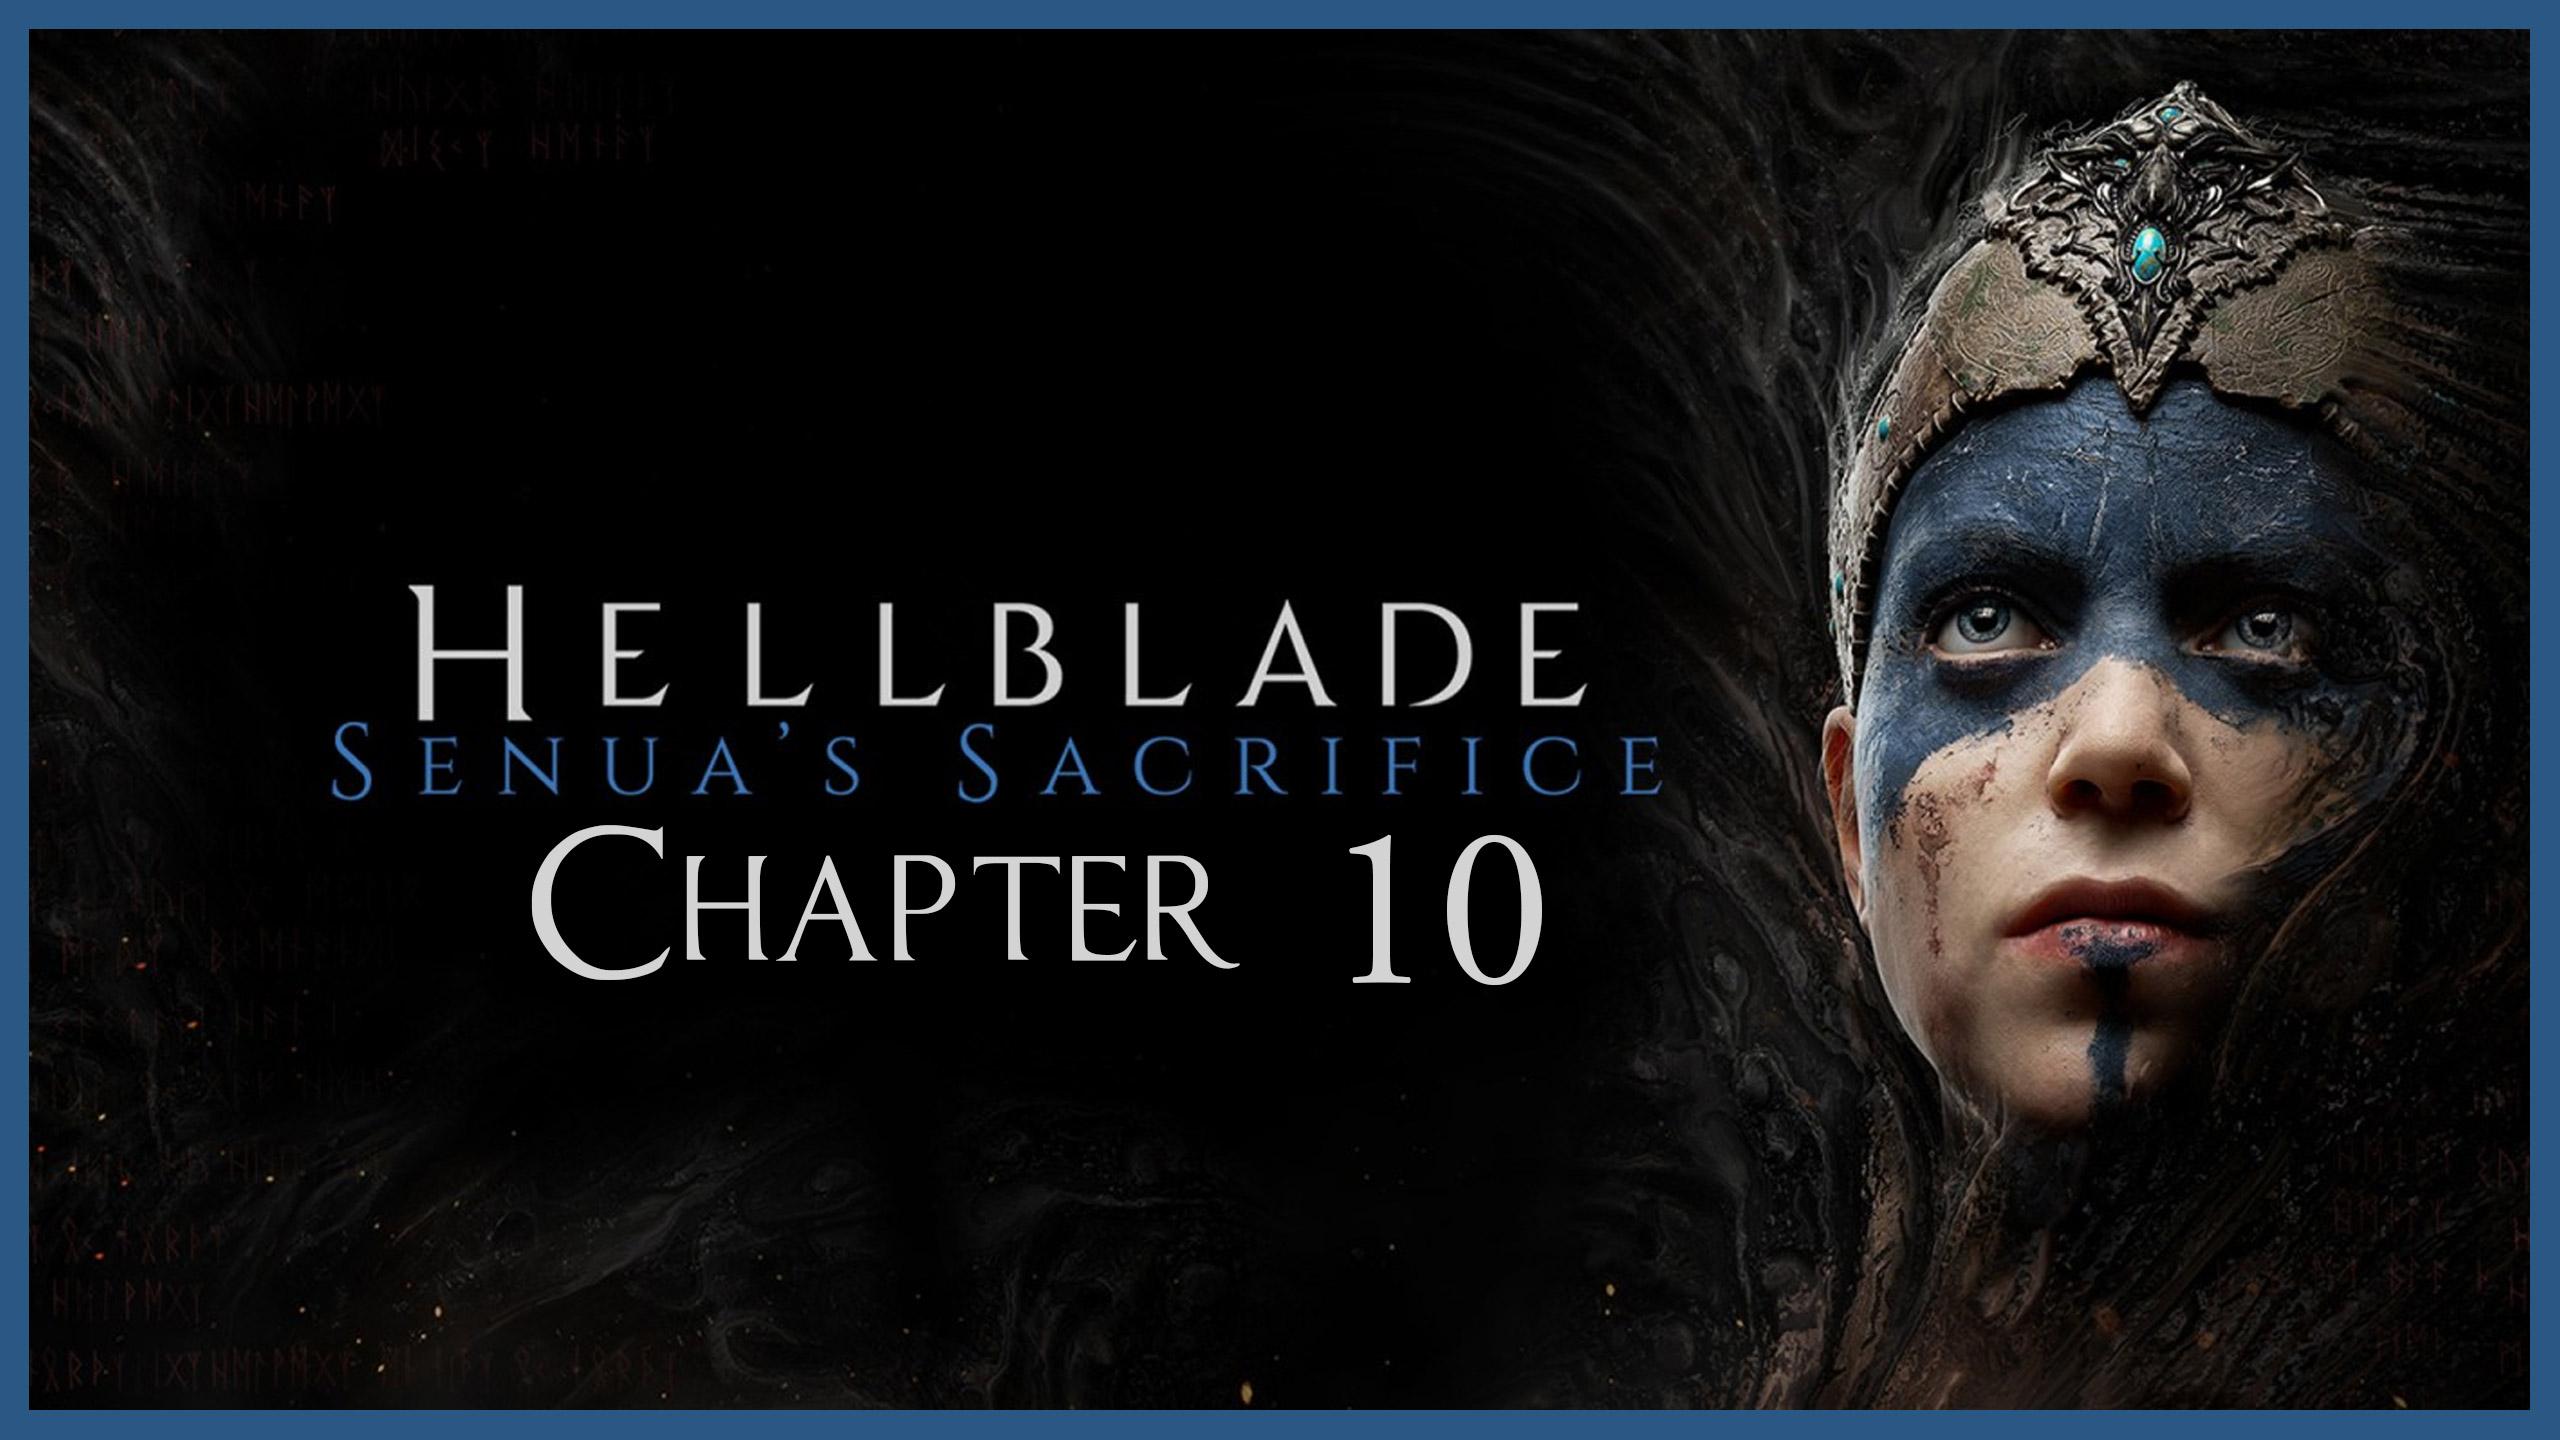 Hellblade Senua's Sacrifice. Все камни знаний. Глава 10